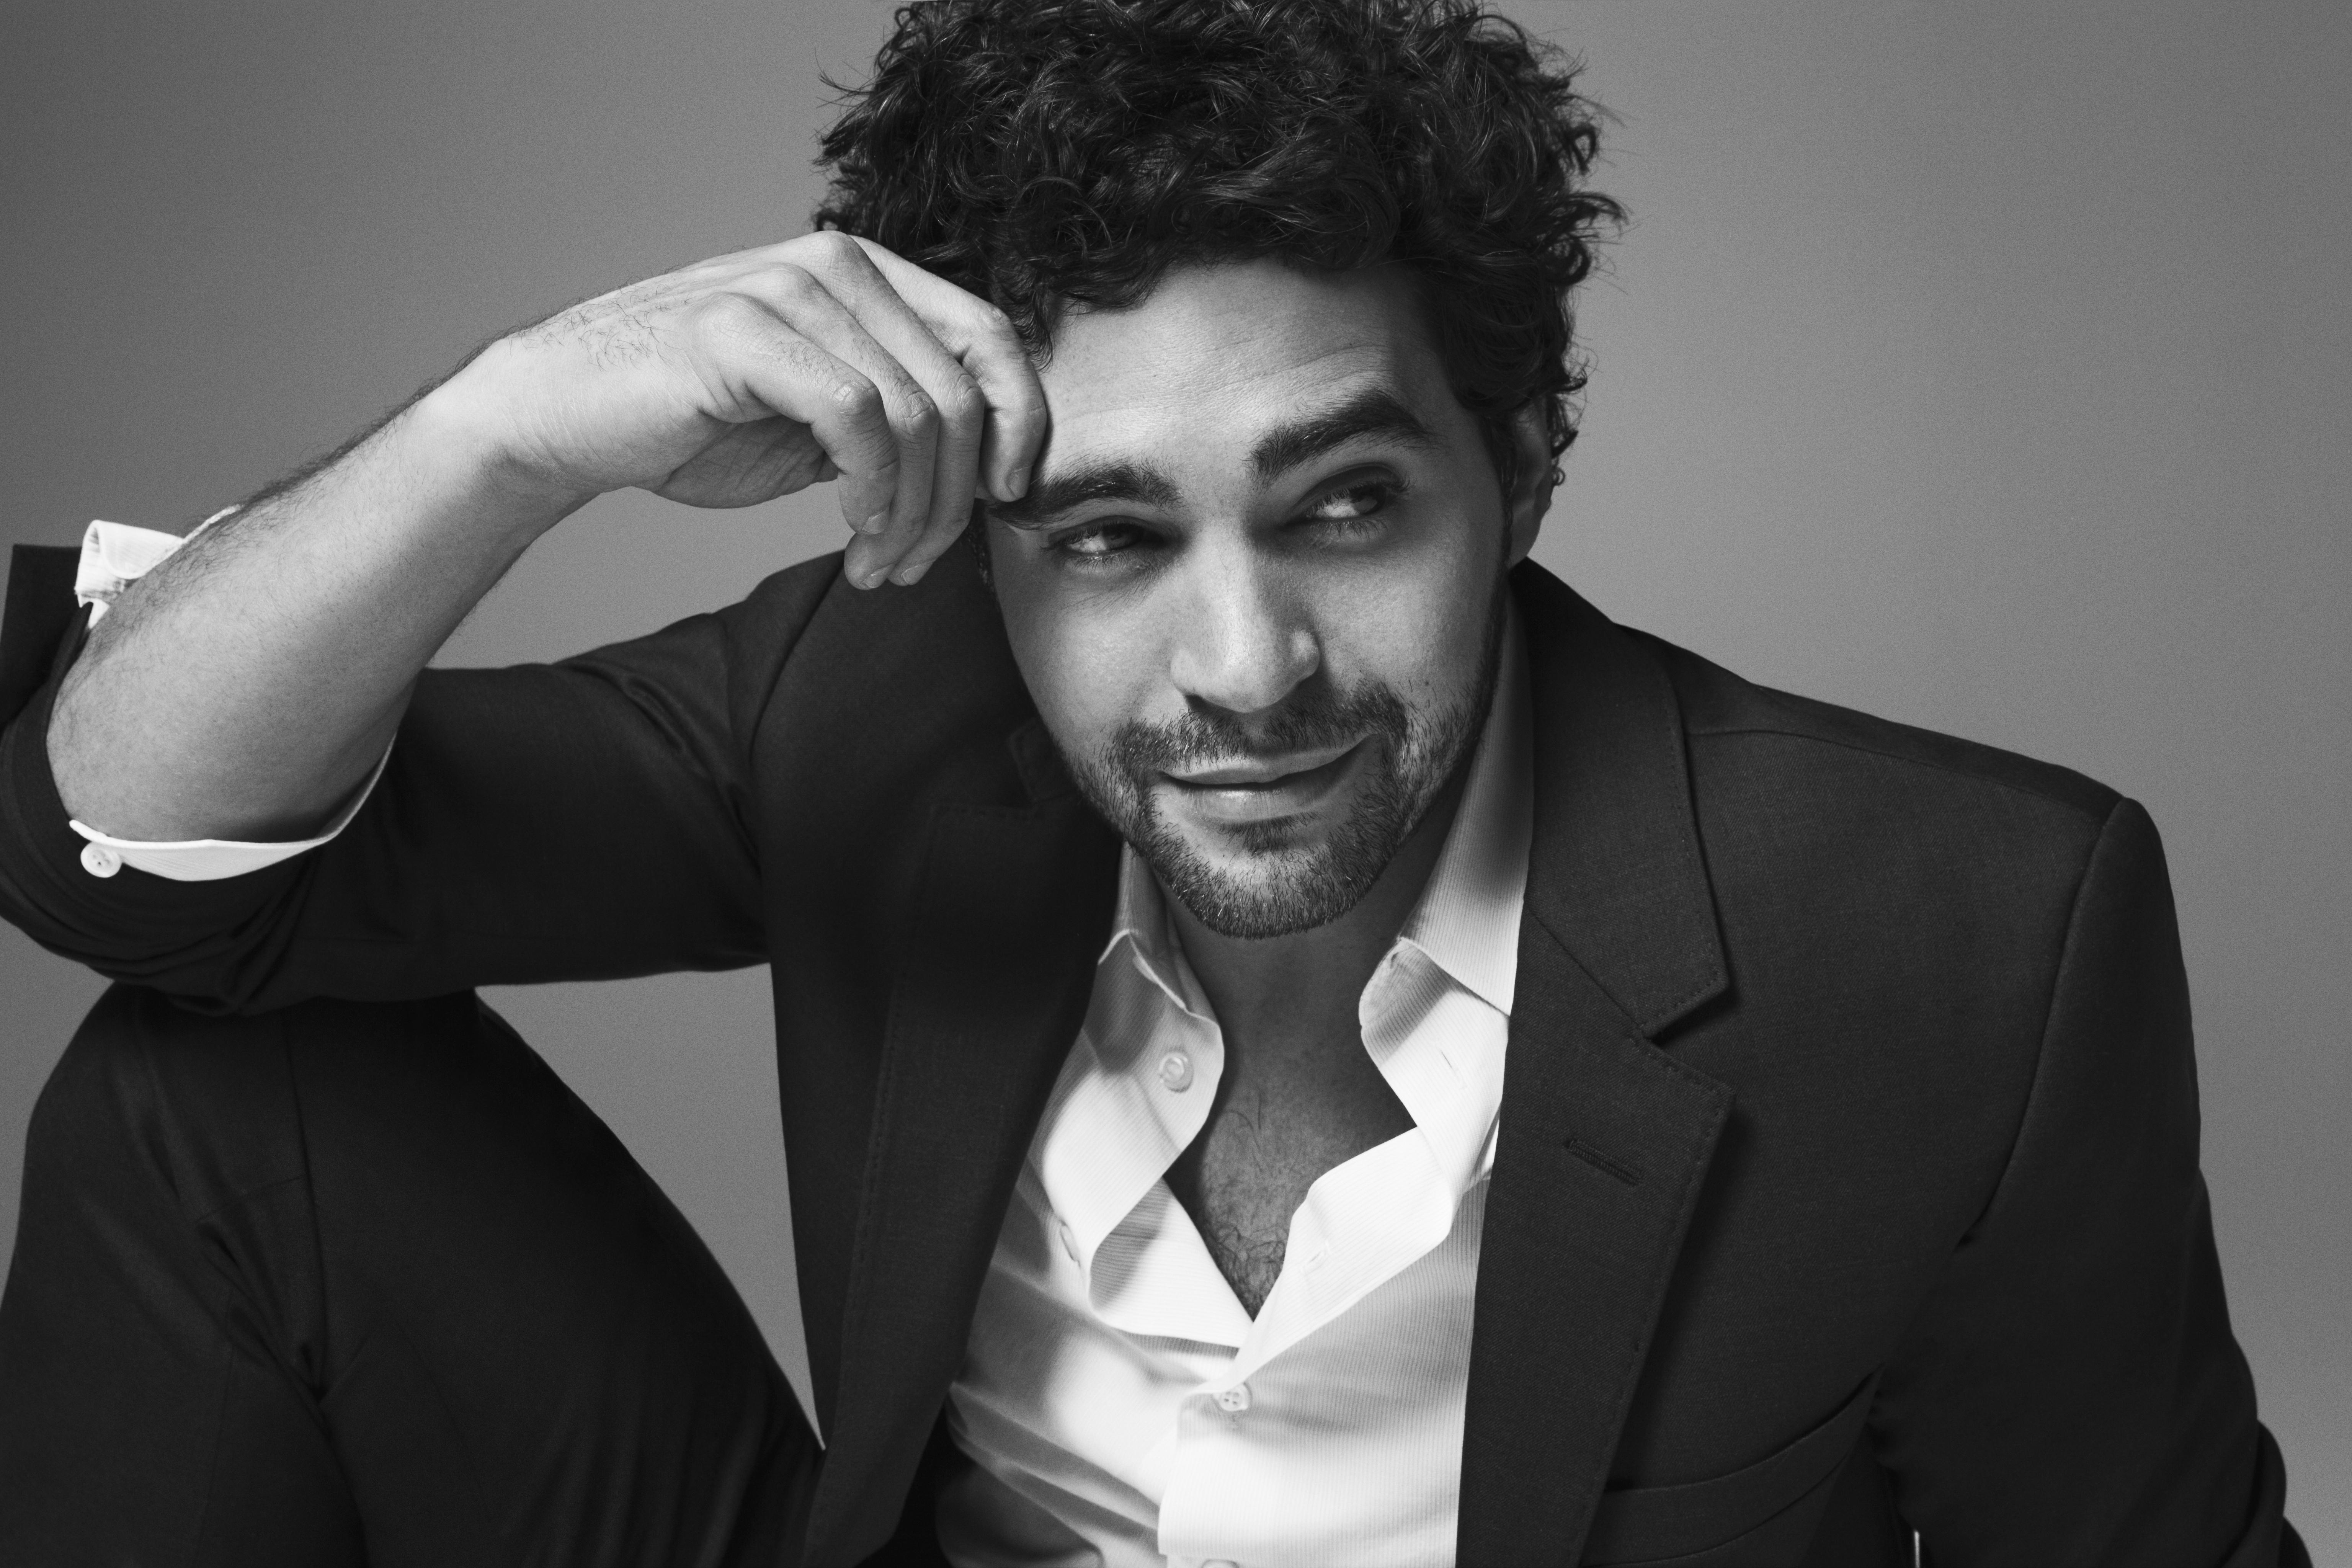 Ramon Rodriguez - IMDb